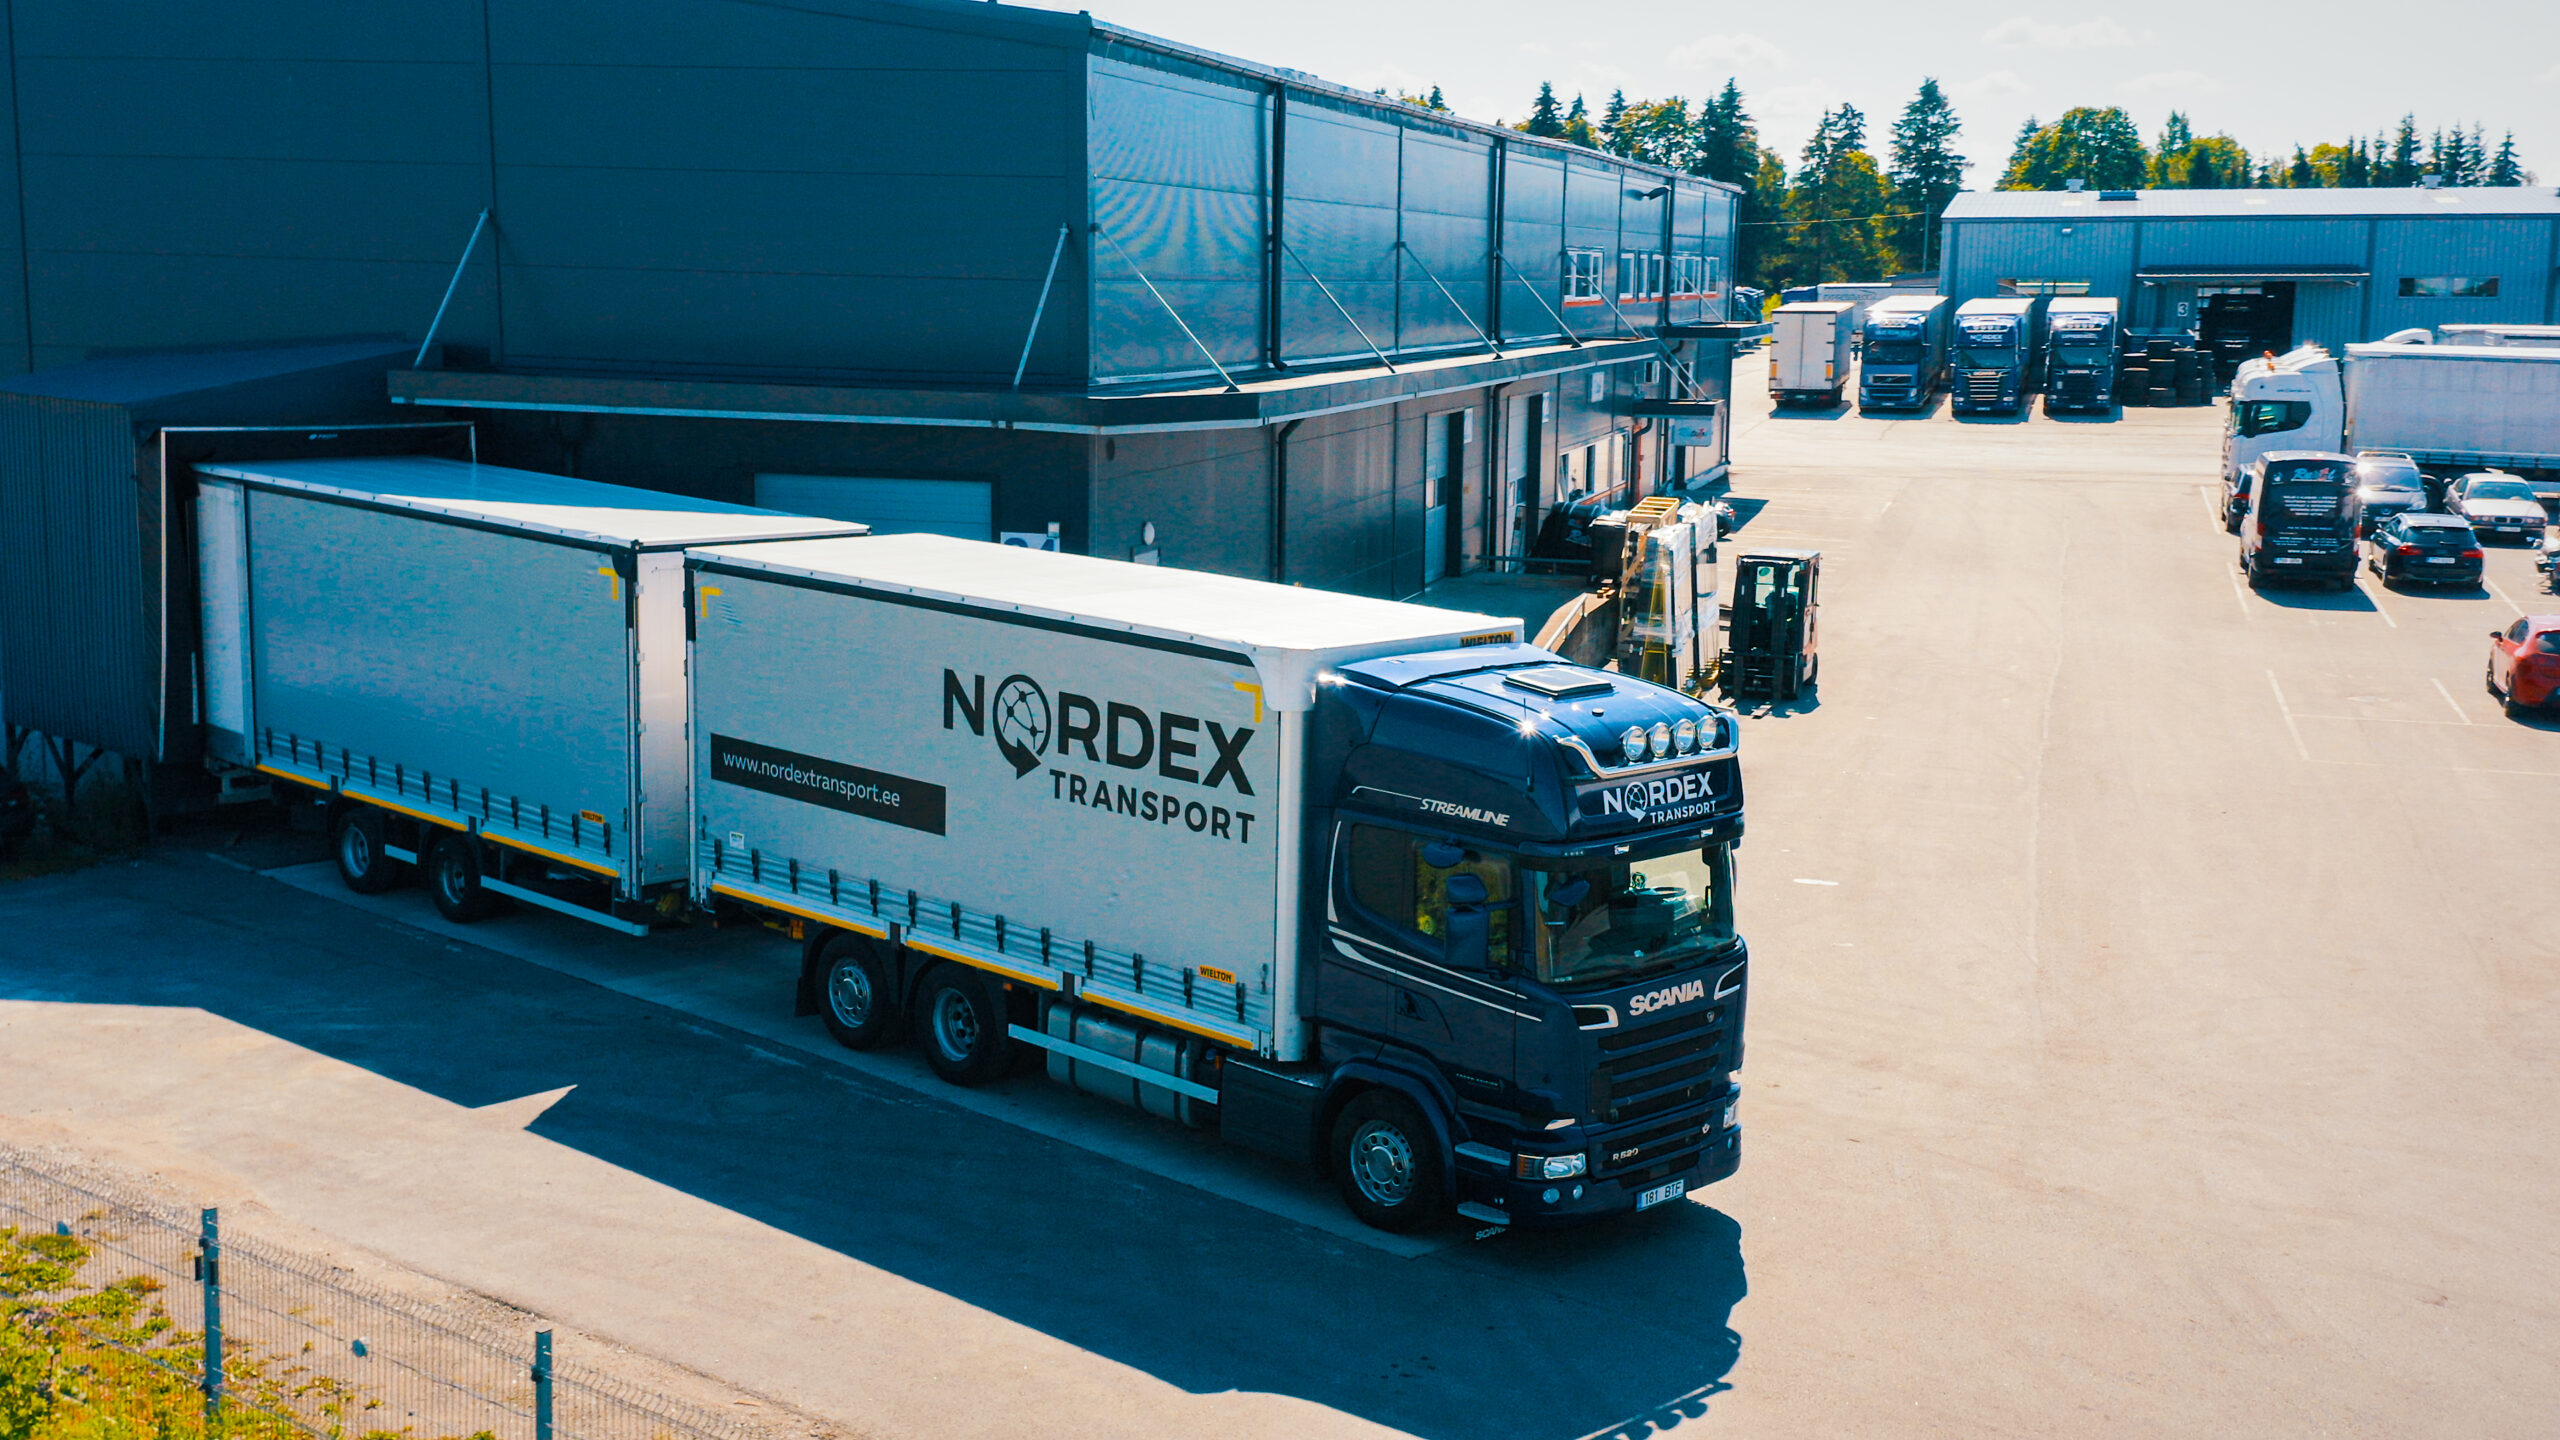 Nordex-Transport-17